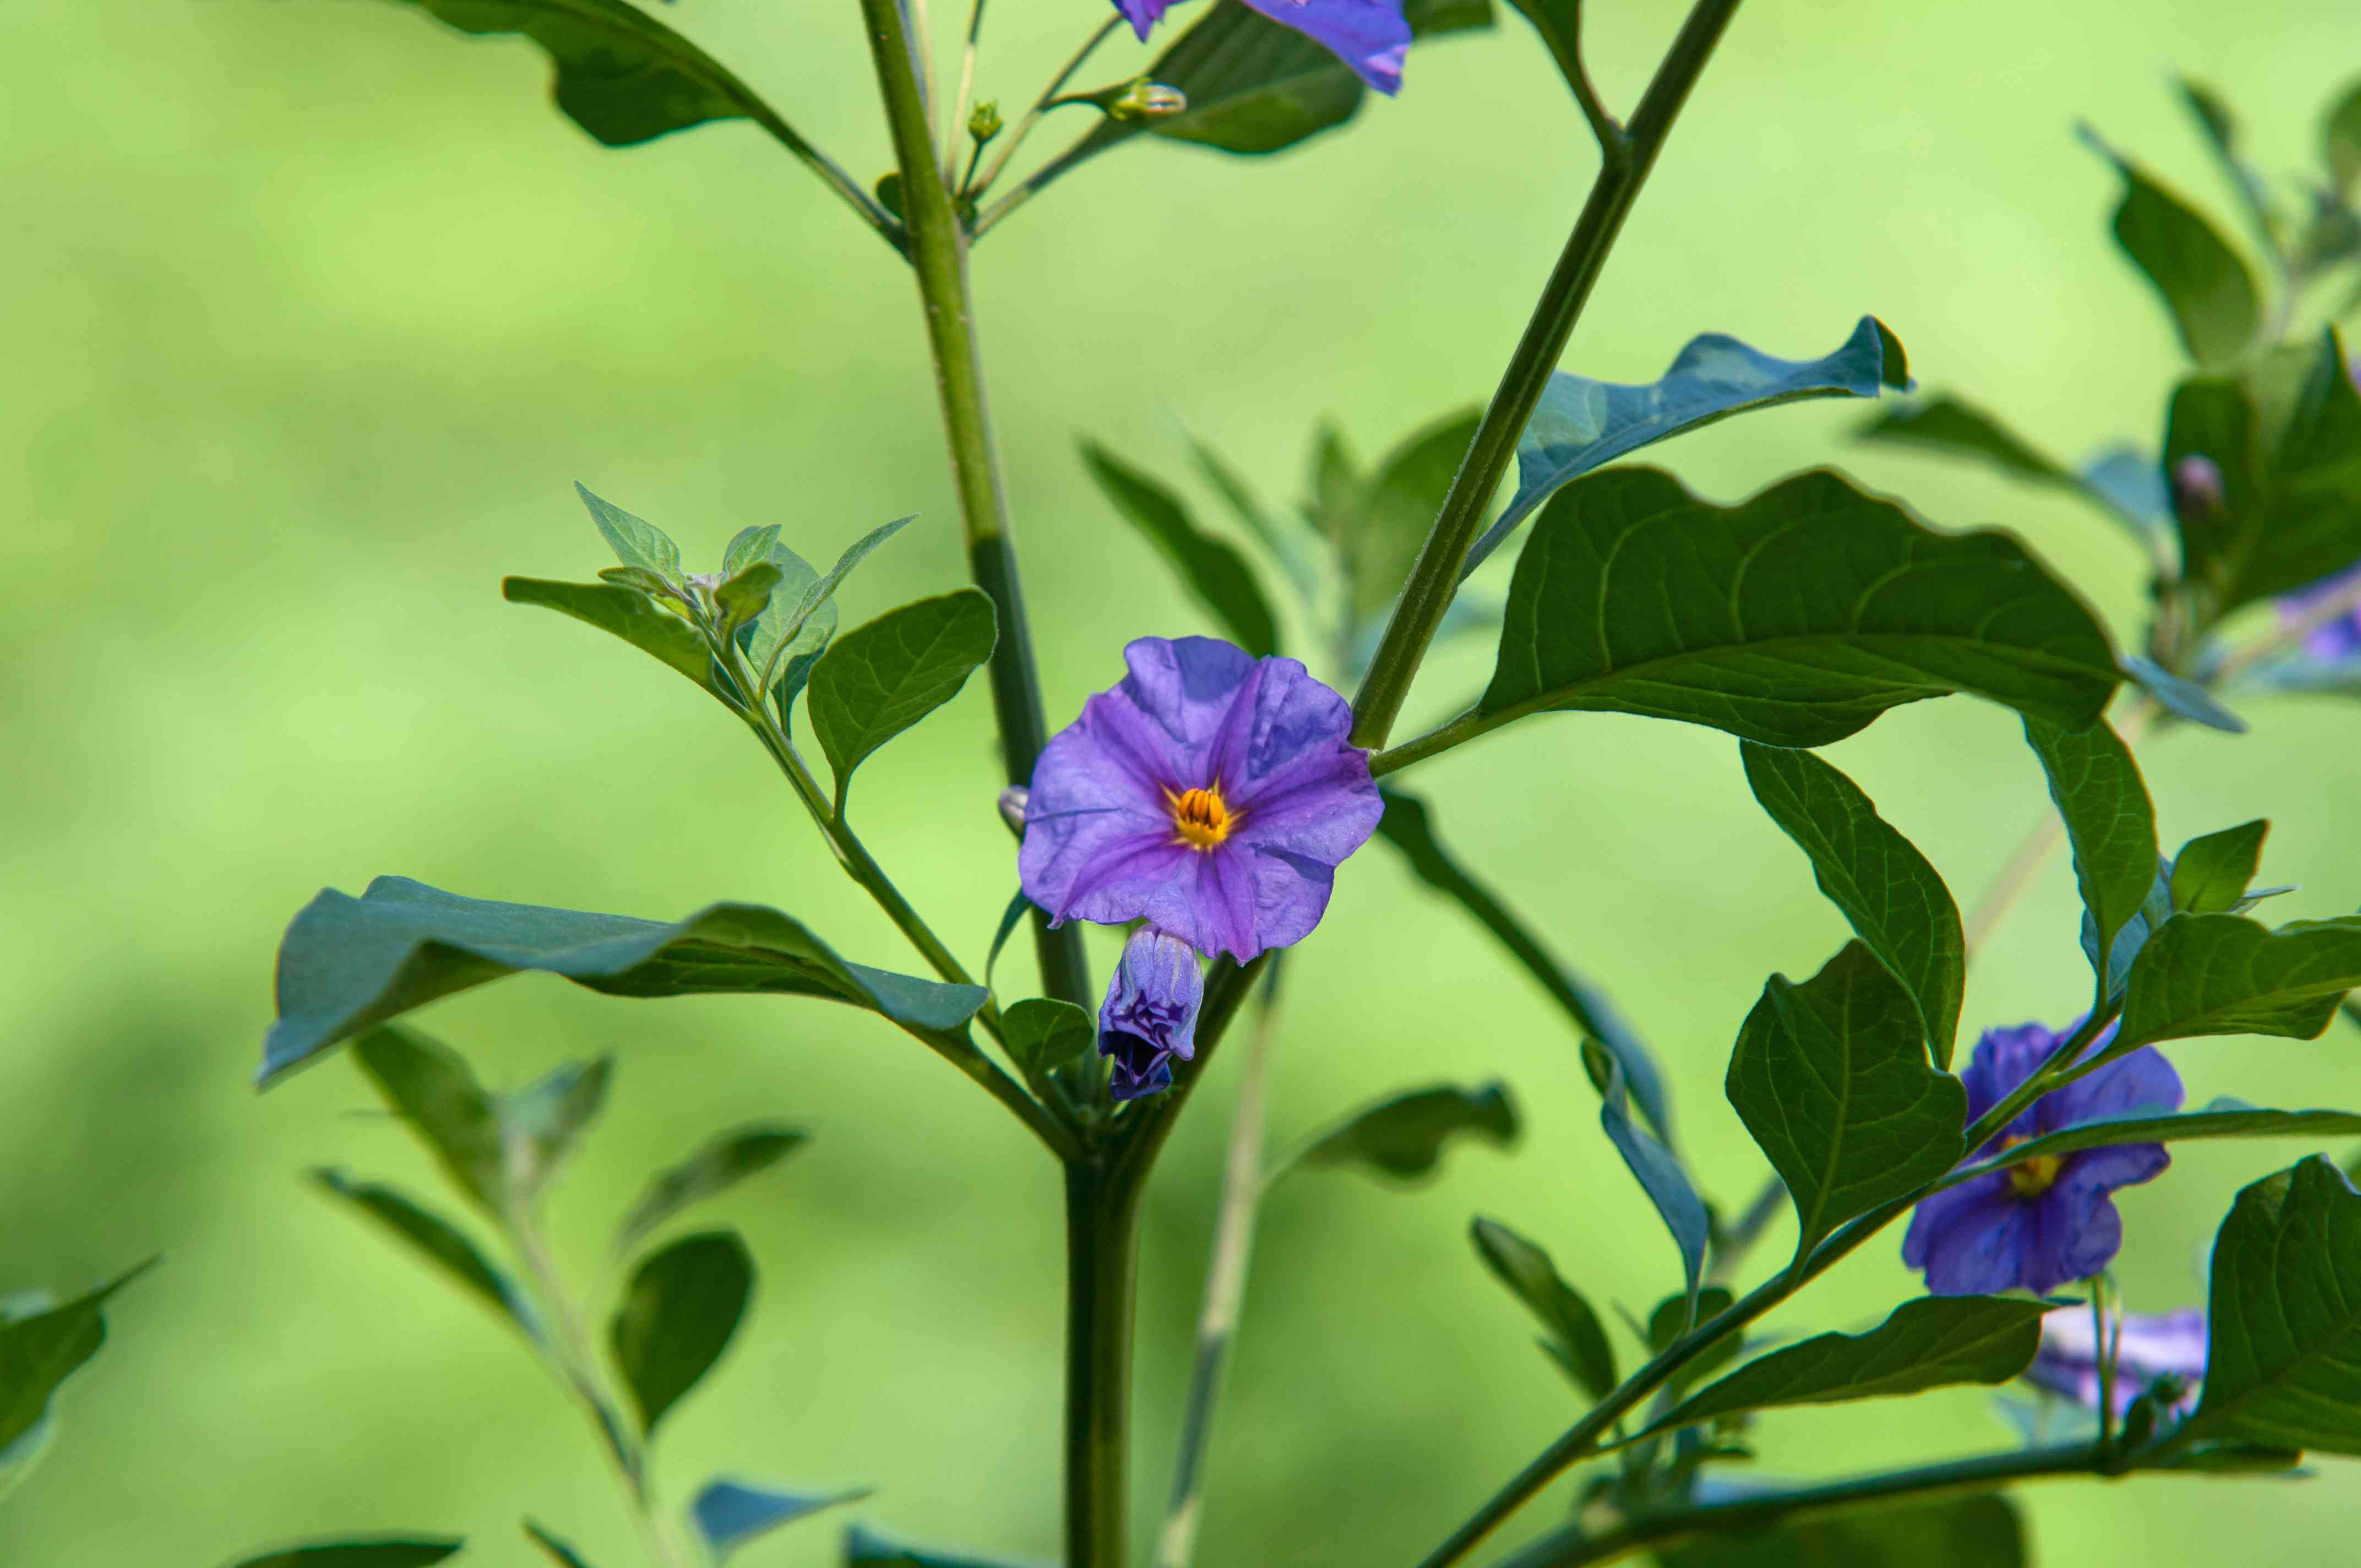 Blue potato bush plant with purple-blue flower in middle of stem